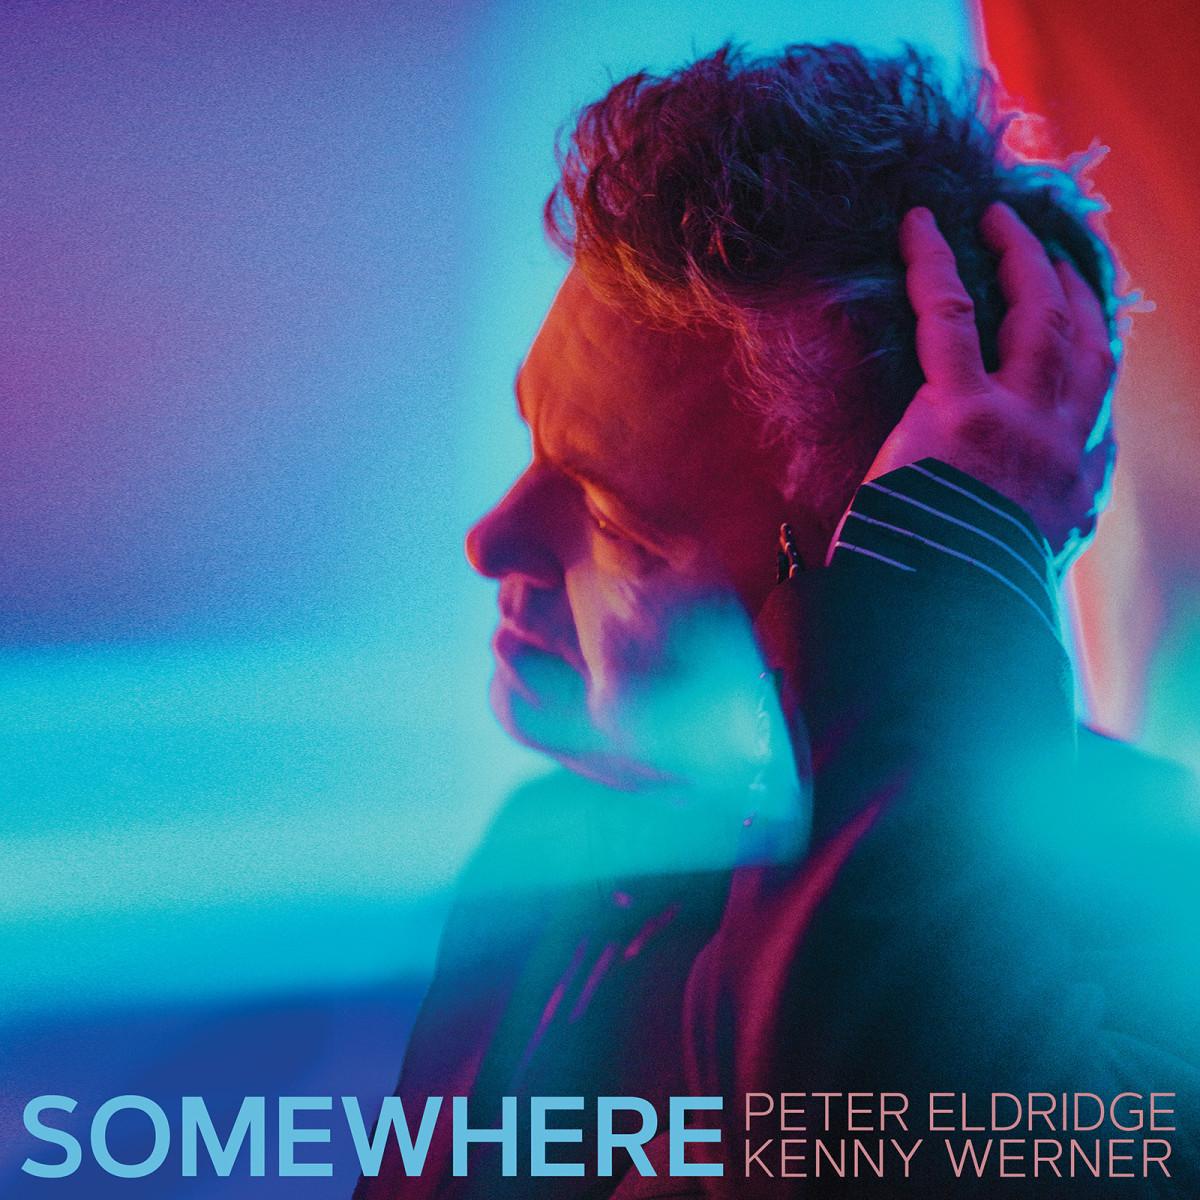 Peter Eldridge cover